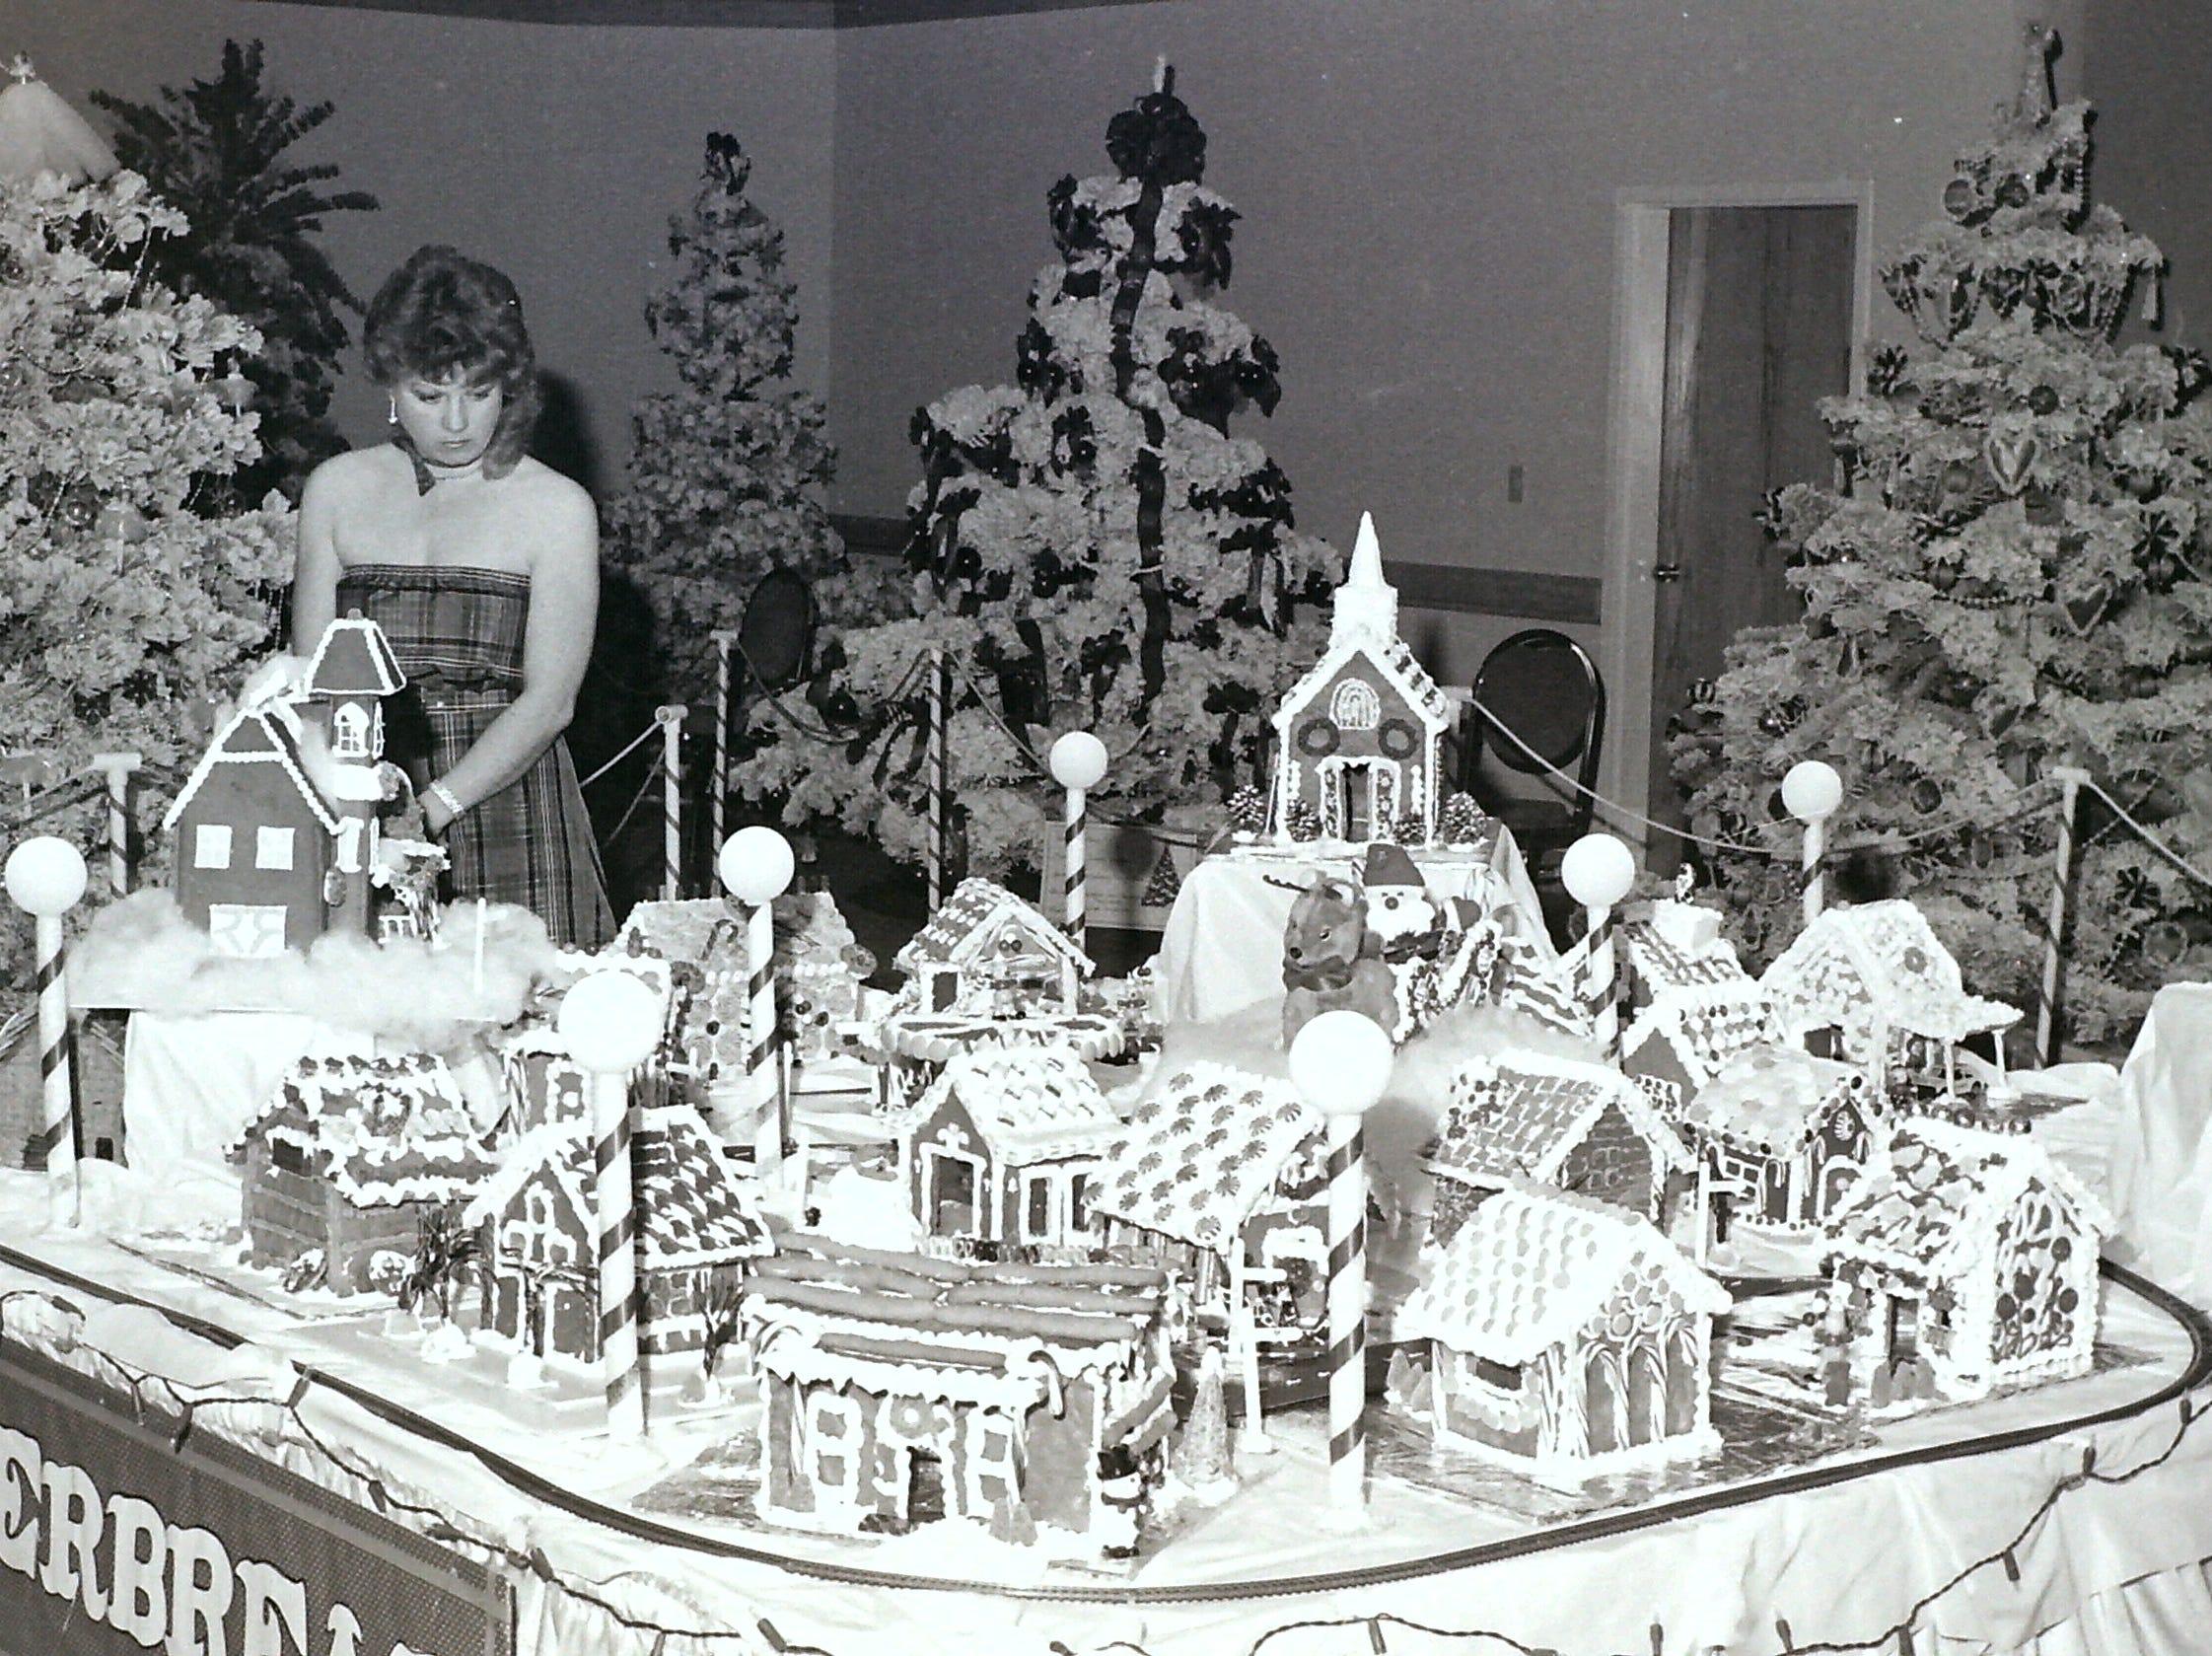 Jubilee of Trees circa 1985.